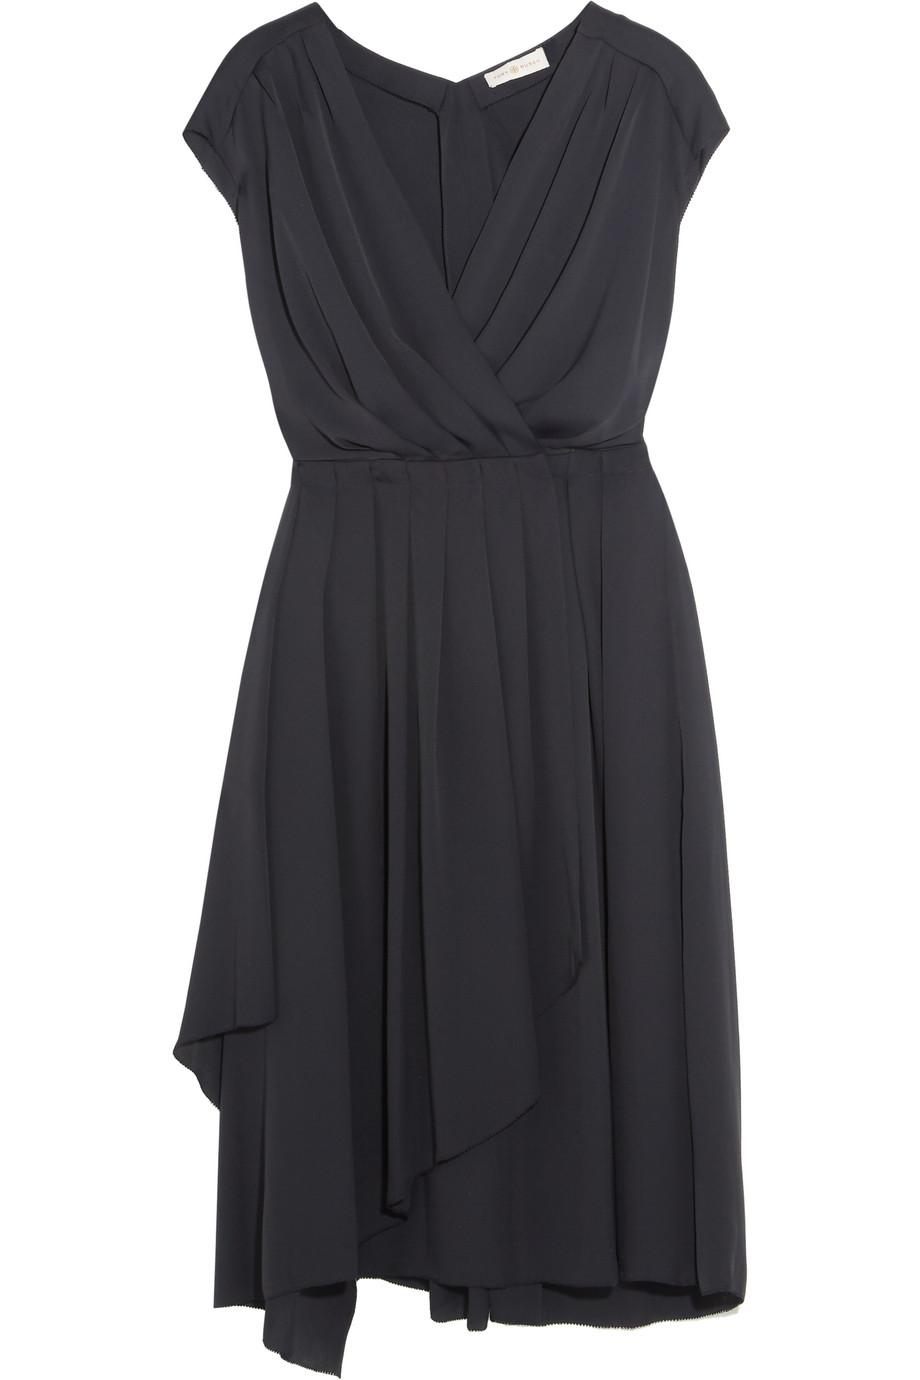 Tory Burch Wrap-Effect Pleated Crepe De Chine Dress, Midnight Blue, Women's, Size: 6